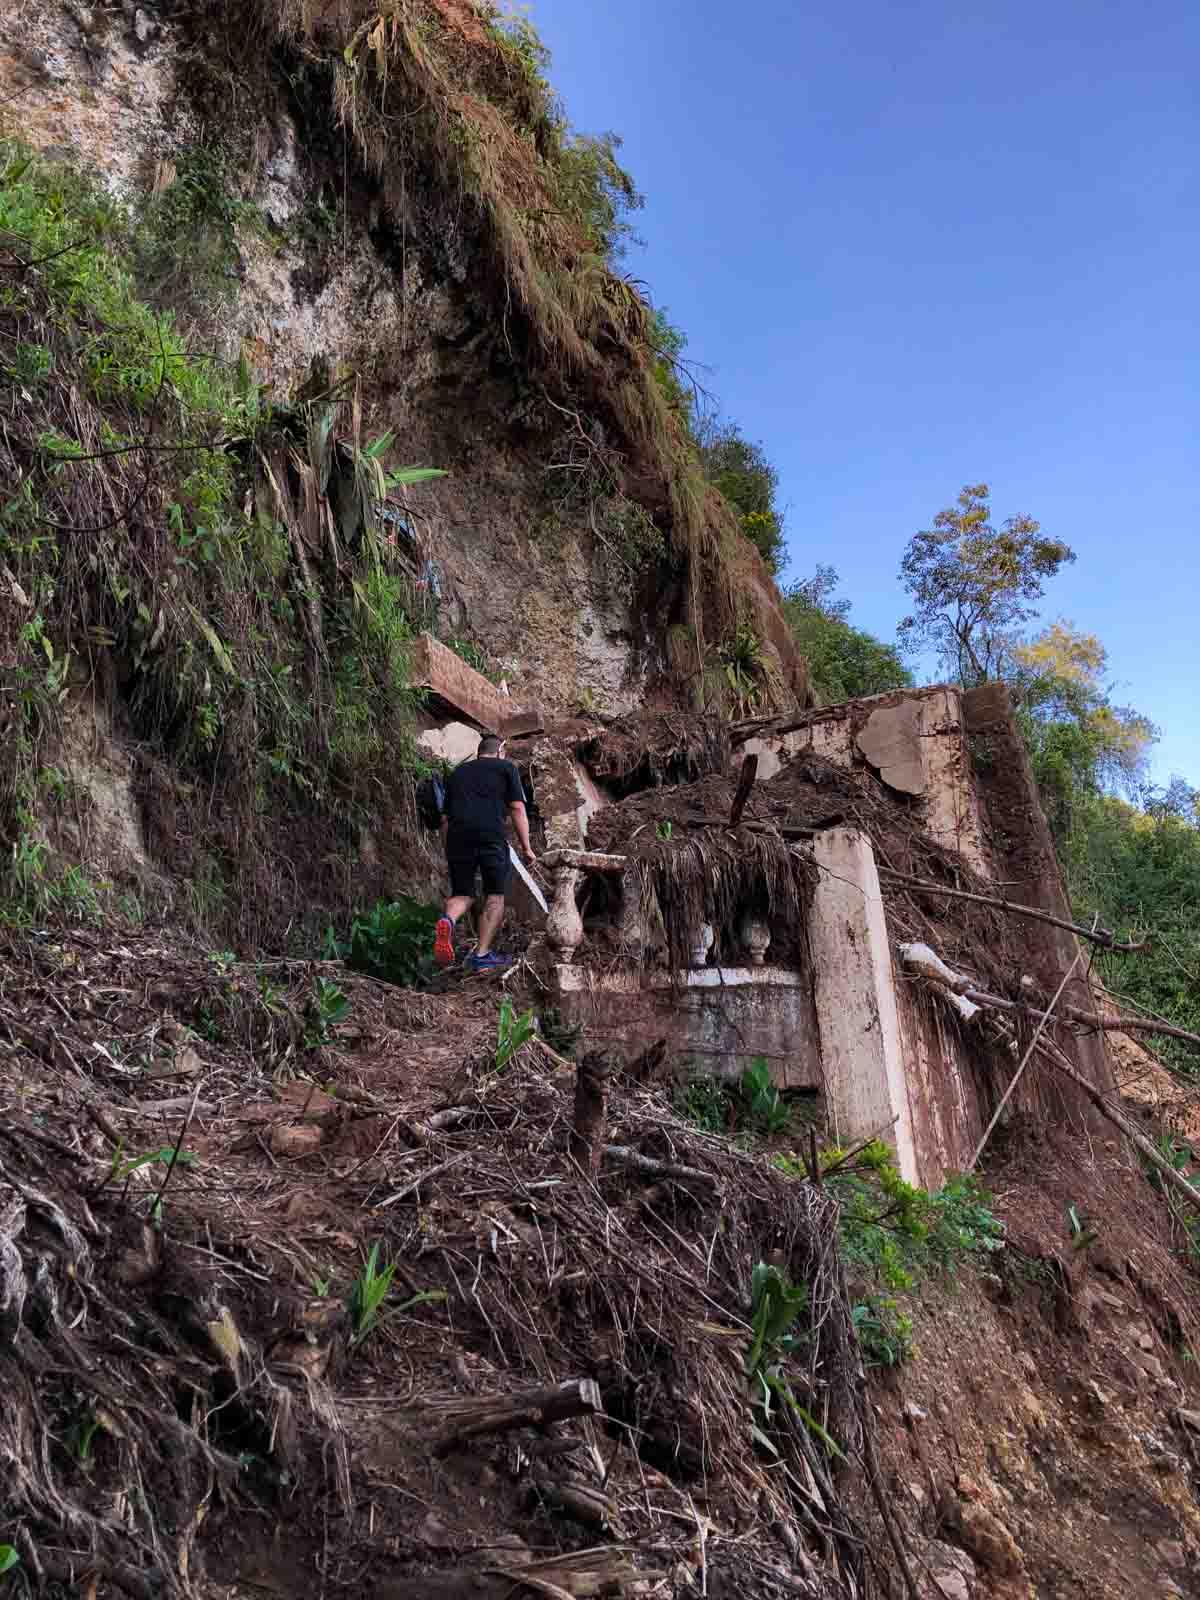 The Cerro Las Nubes hike in Jerico, Colombia was adventurous.